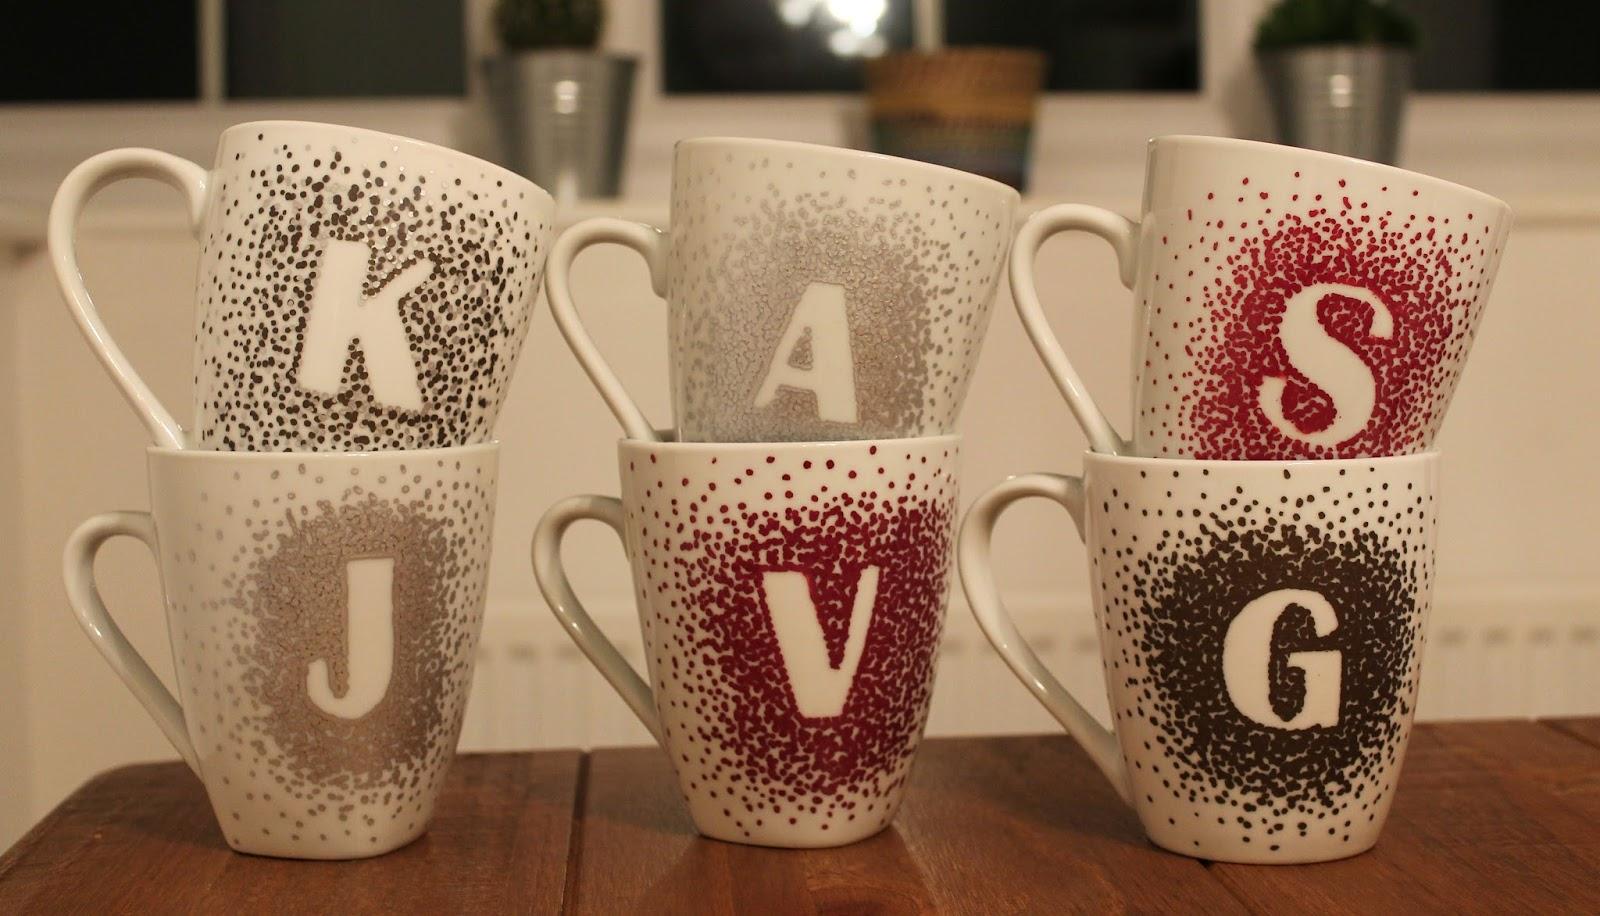 Christmas Homemade Personalised Mug and Hot Chocolate Gift Idea